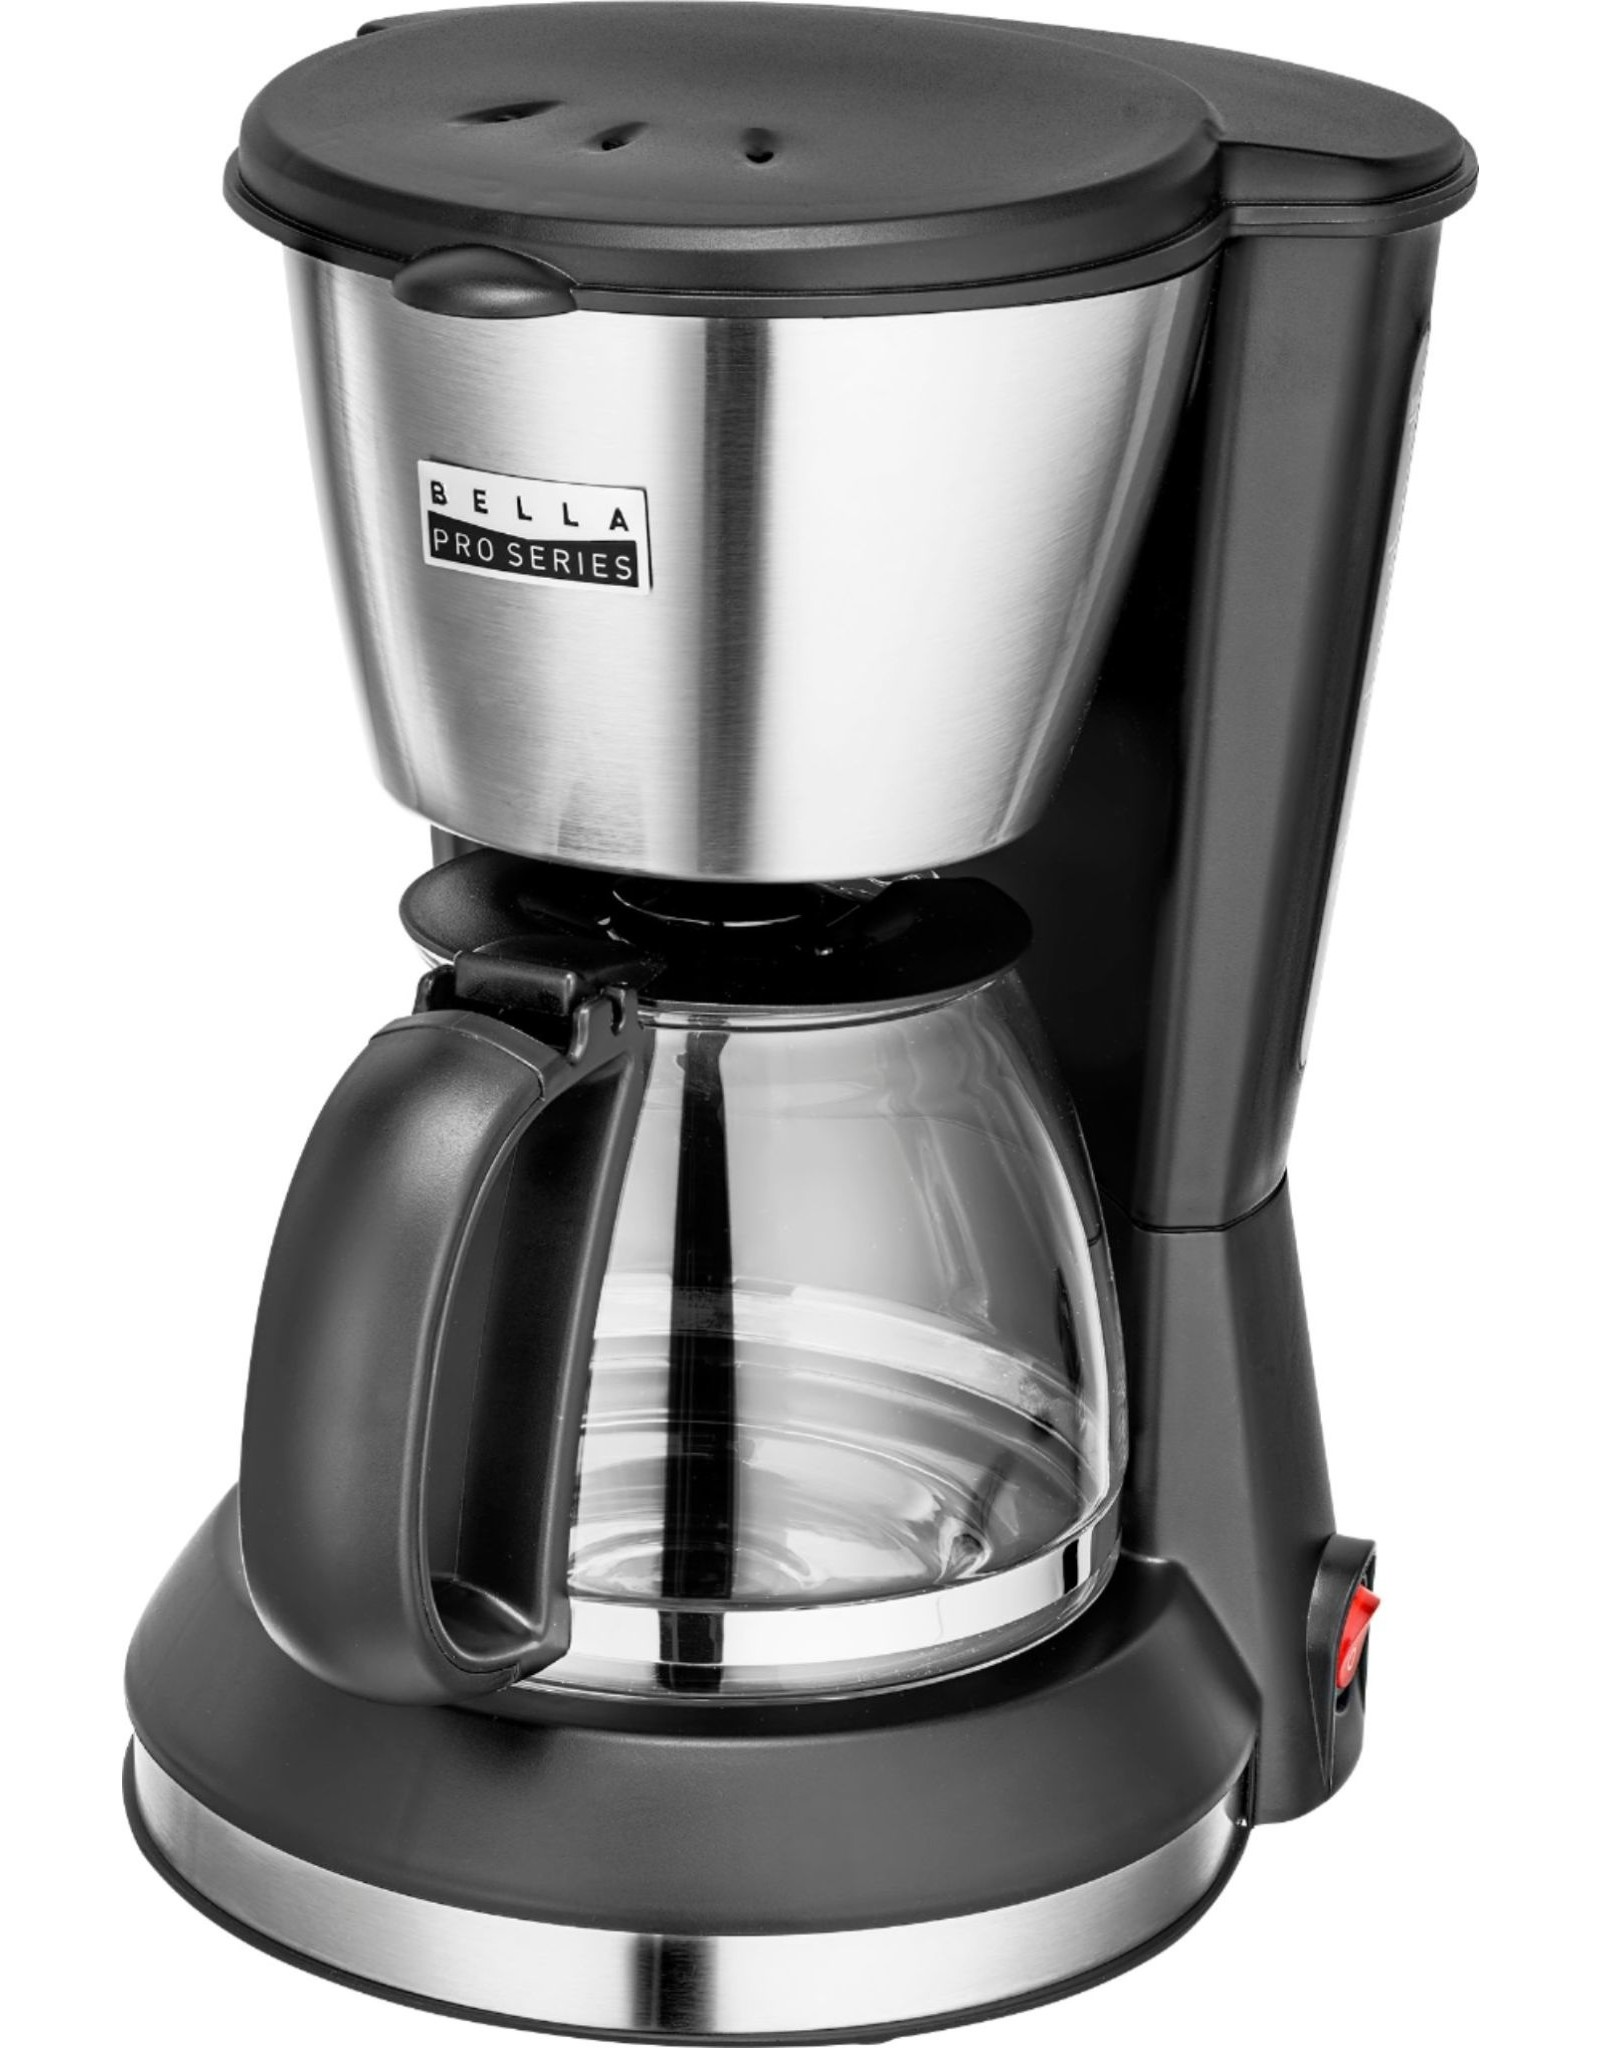 Bella pro 90071  Bella Pro Series - 5-Cup Coffee Maker - Stainless Steel